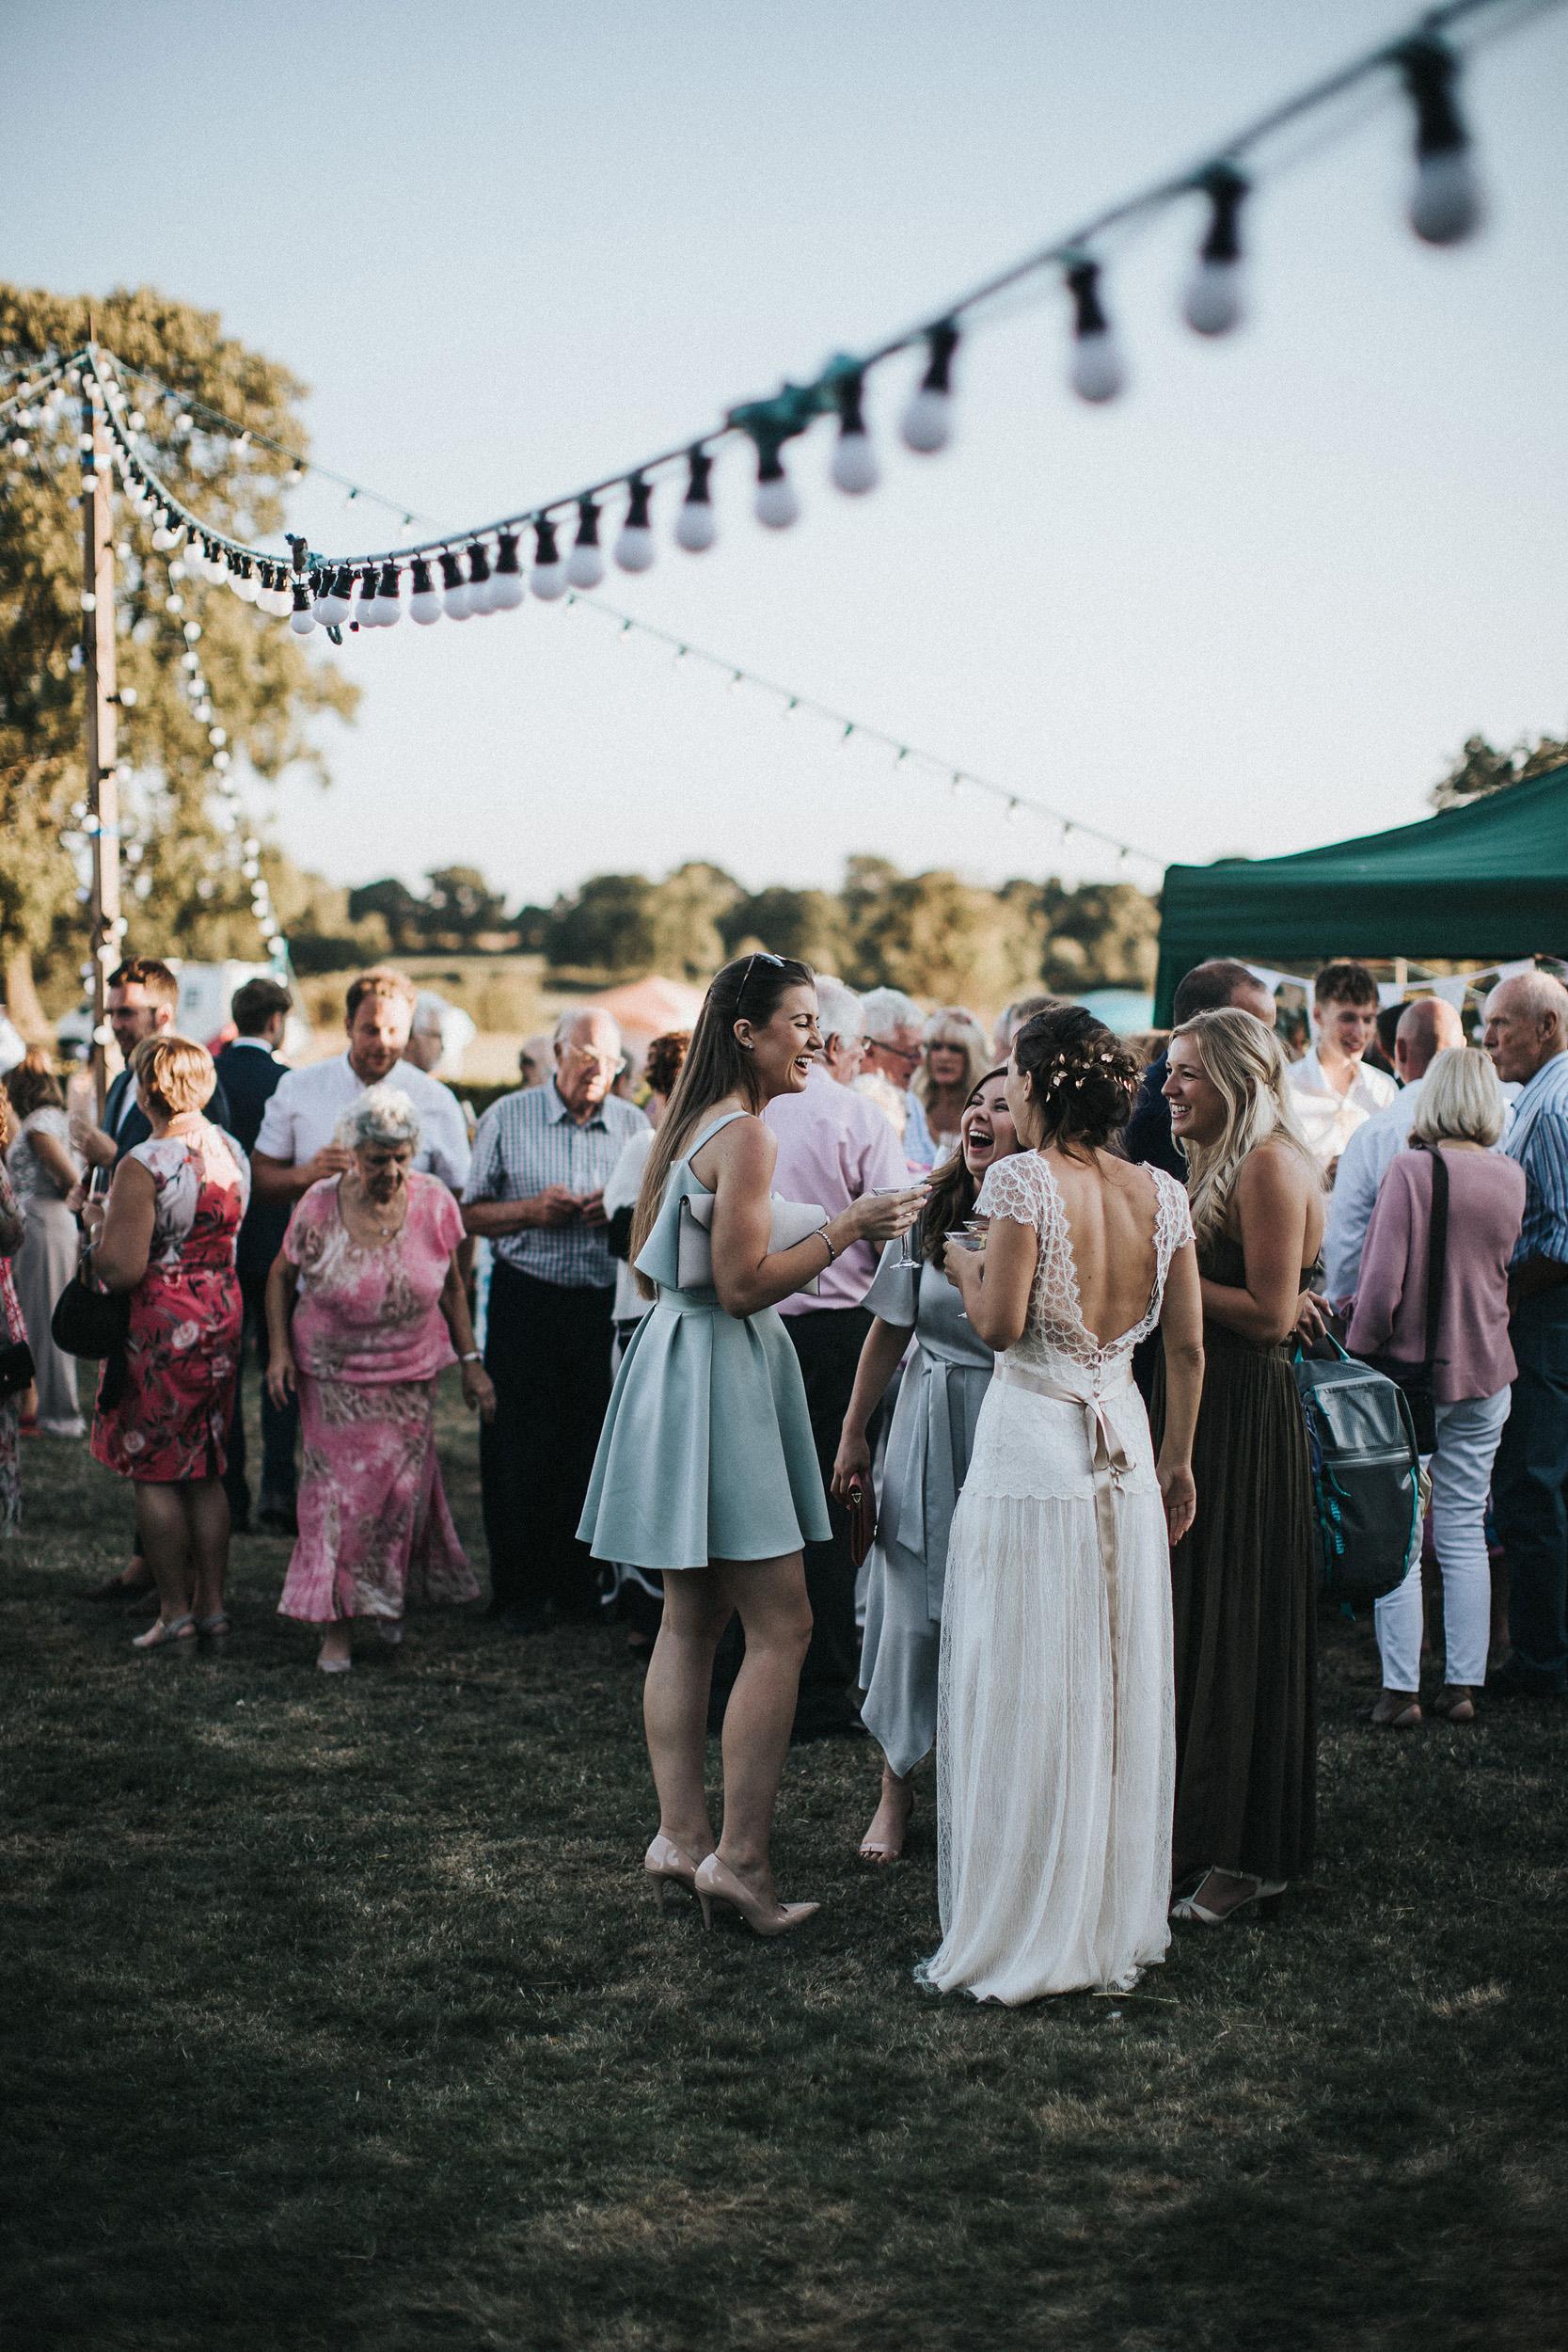 Martha-Laid-Back-Garden-Wedding-Lace-Wedding-Dress-Bohemian-Kate-Beaumont-60.jpg